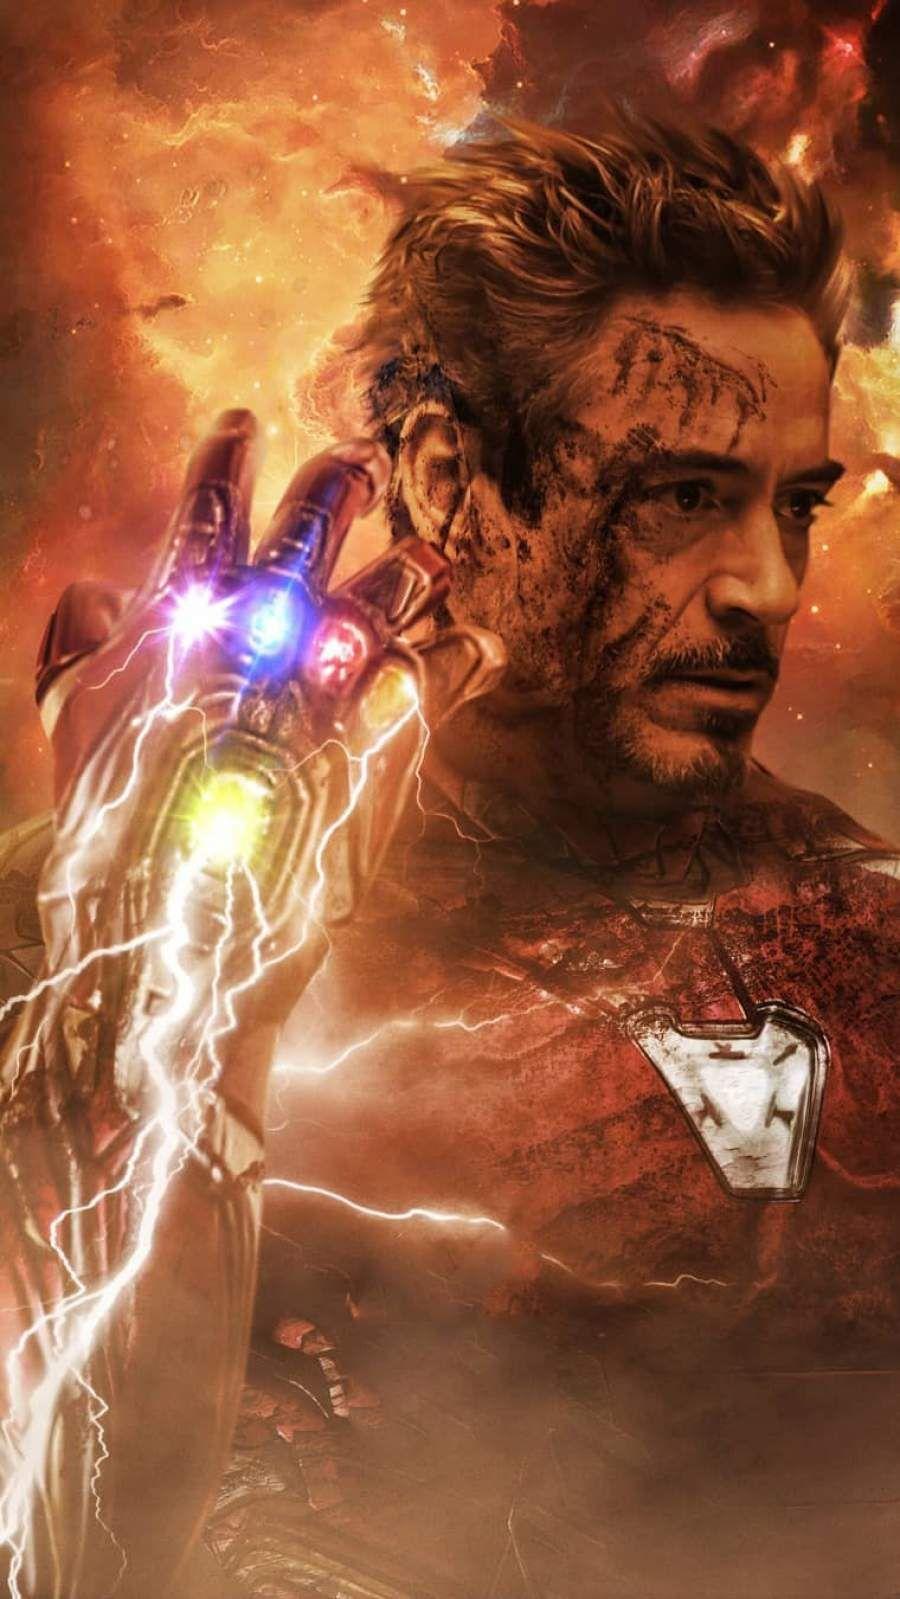 I Am Iron Man Snap Iphone Wallpaper Iphone Wallpapers Marvel Iron Man Iron Man Avengers Iron Man Wallpaper